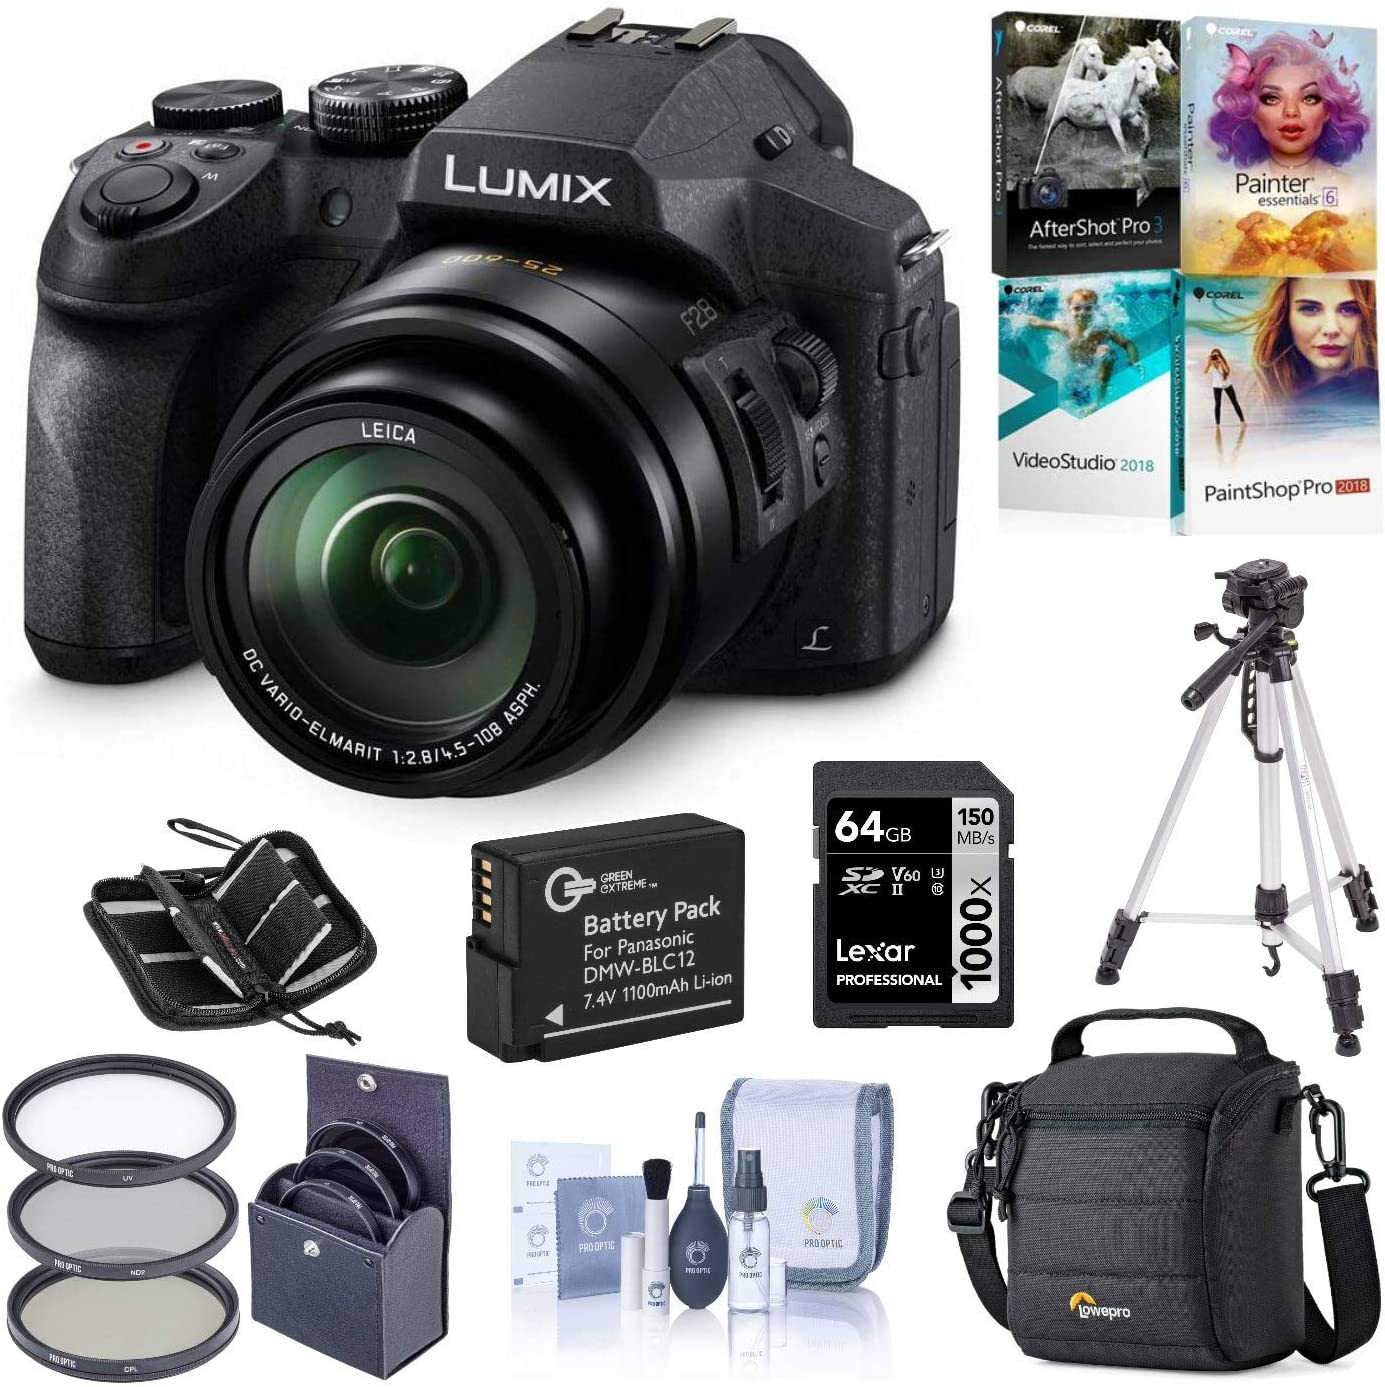 Panasonic Lumix DMC-FZ300 Digital Camera, 12.1 Megapixel, 1/2.3-inch Sensor, 4K Video, 24X Zoom Lens F2.8 Bundle with Bag, Filter, Battery, 64GB SD Card + Case, Tripod, PC Software, Cleaning Kit